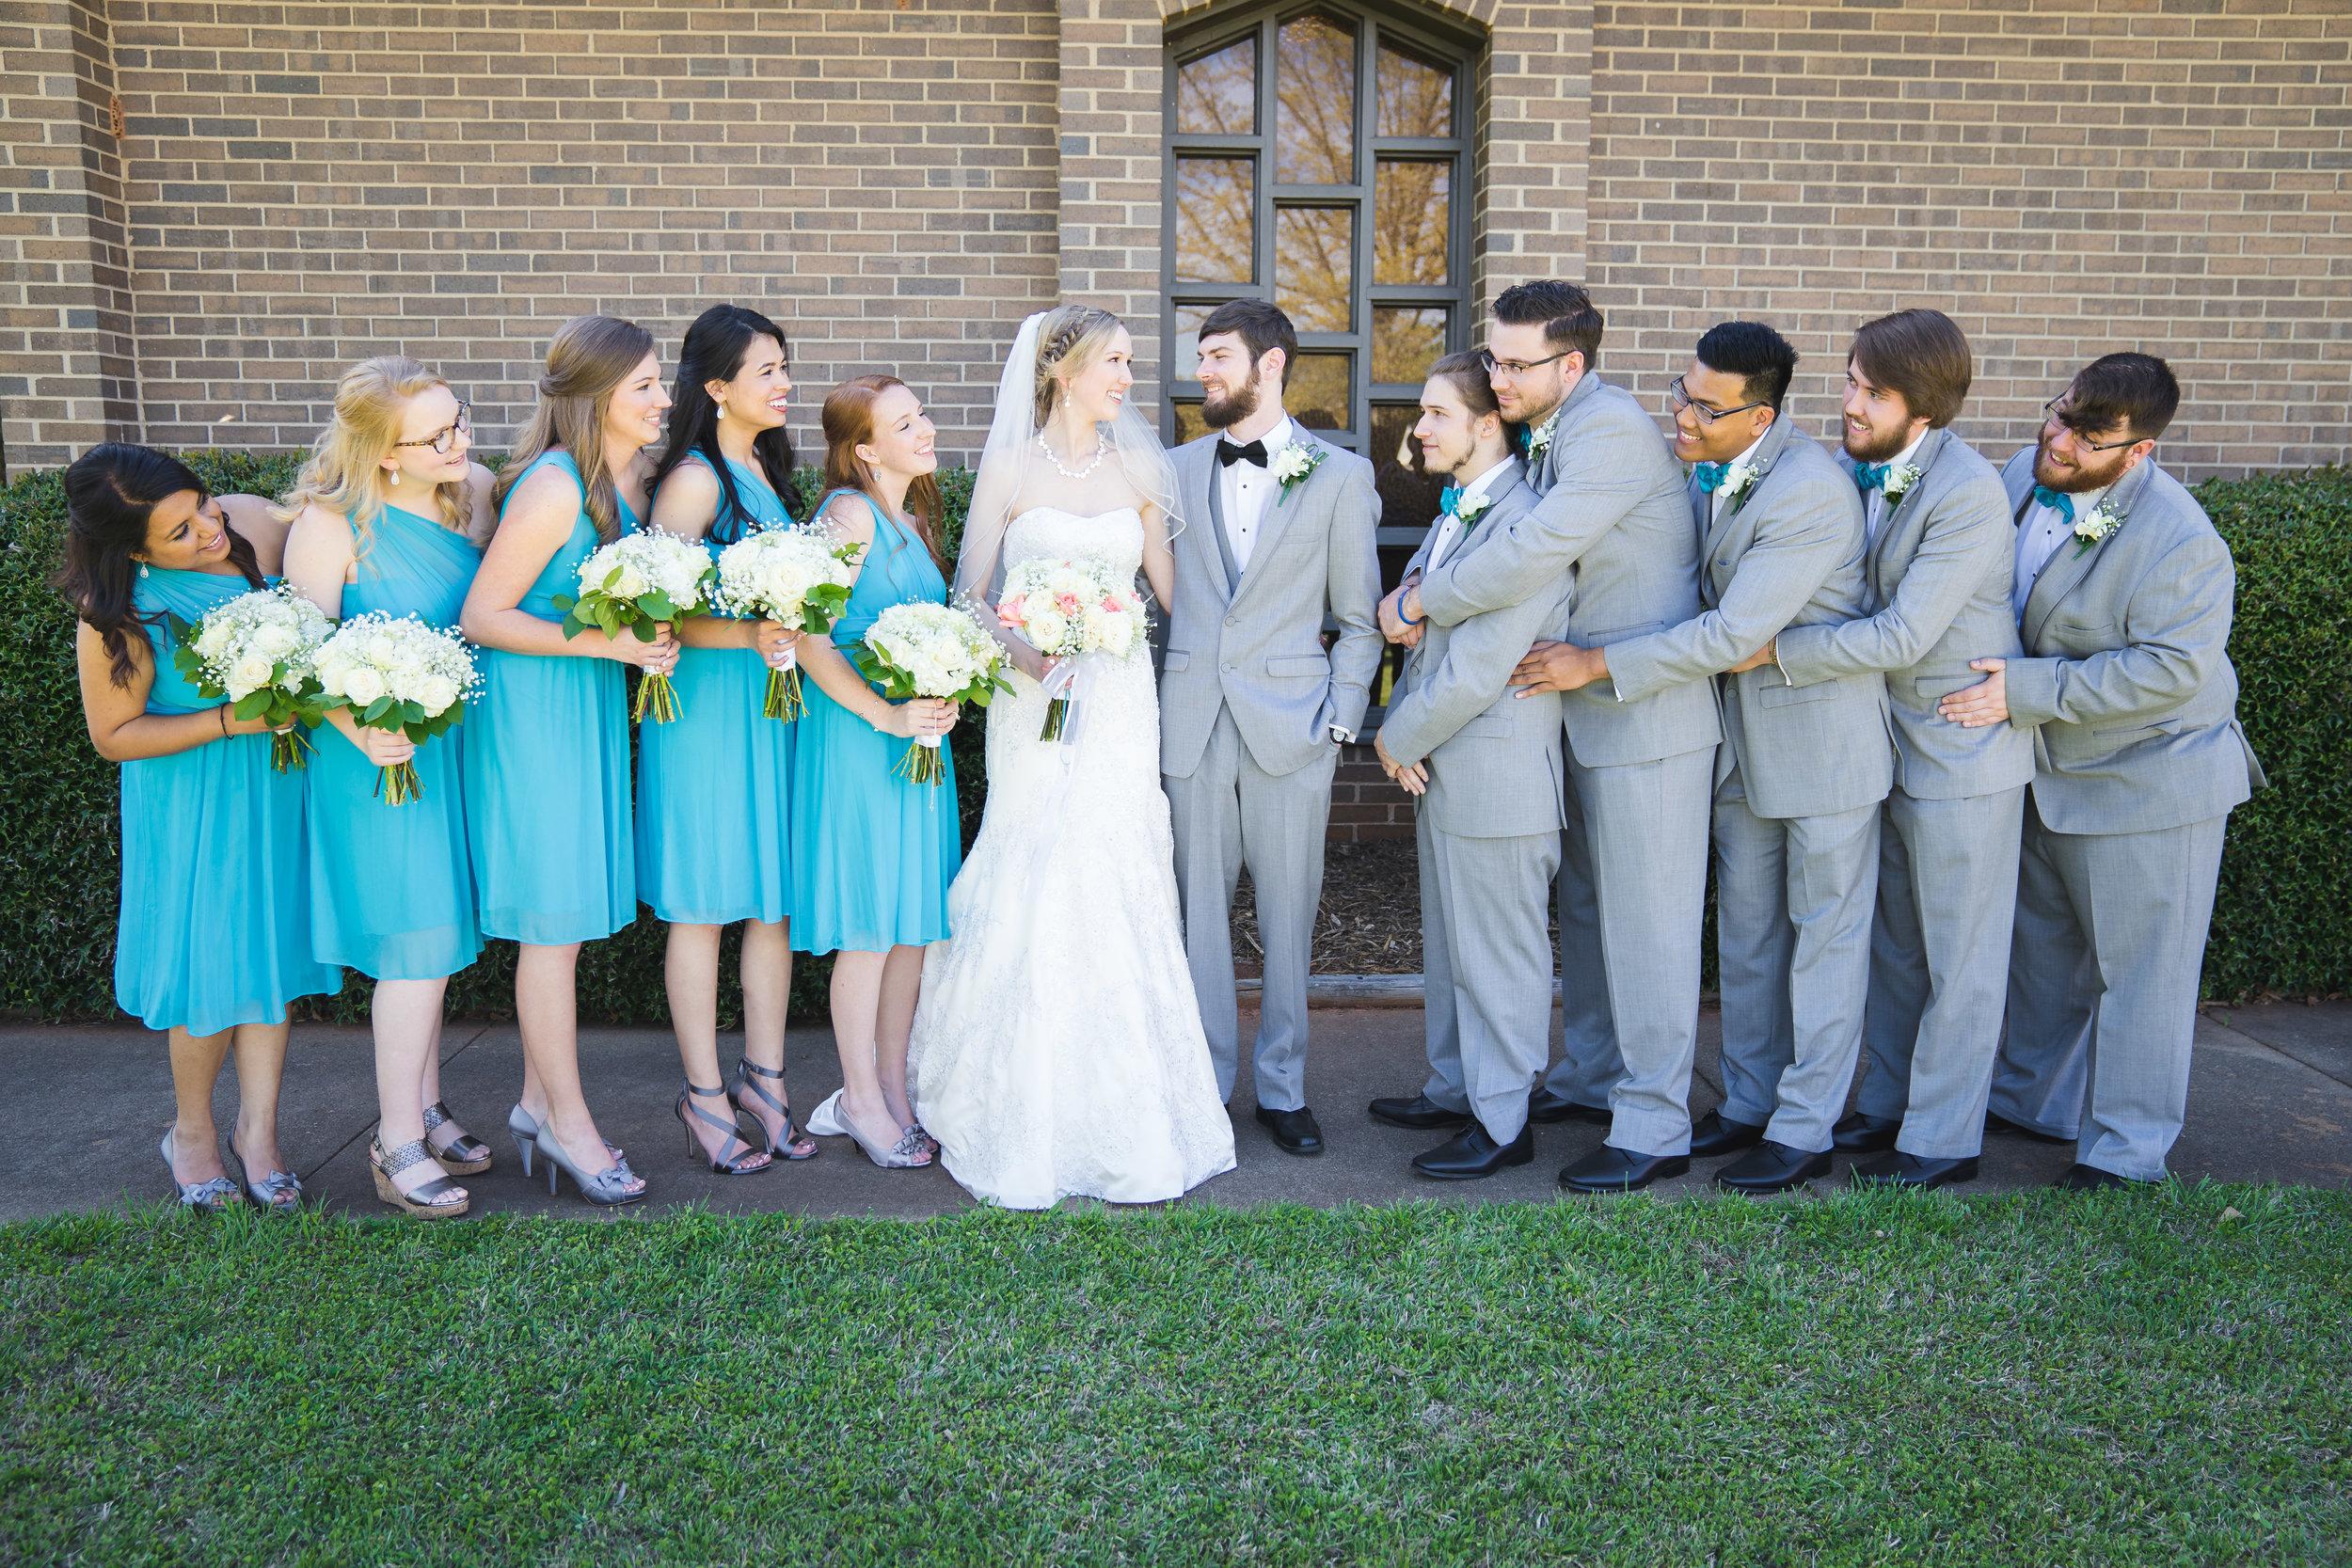 Greenville Wedding | Morningside Baptist Church Spartanburg SC Wedding party